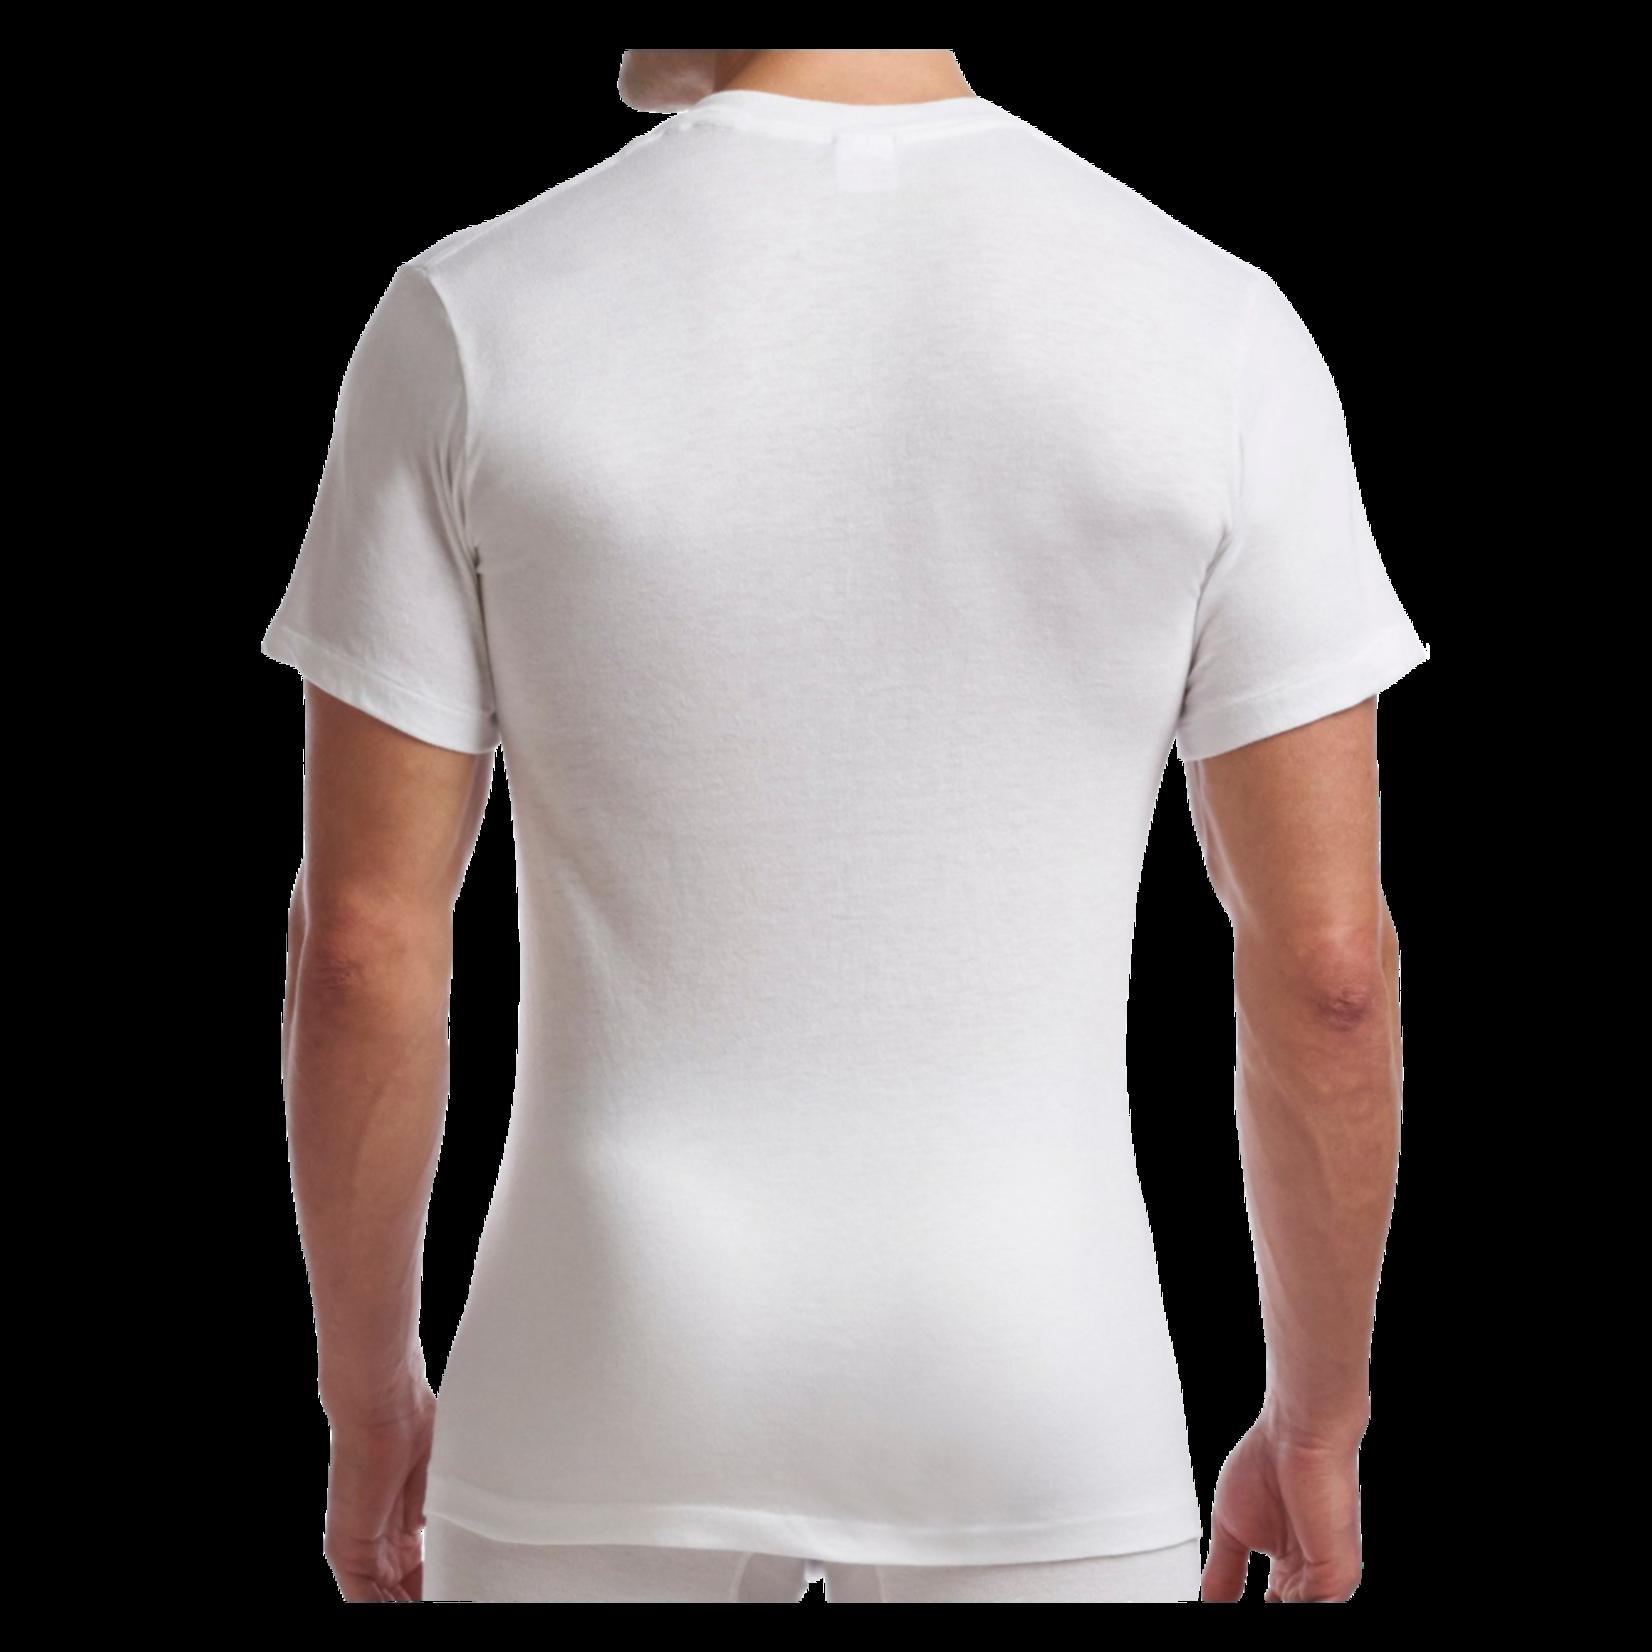 Stanfields Stanfields 6758W Men's TALL V-Neck T-Shirt